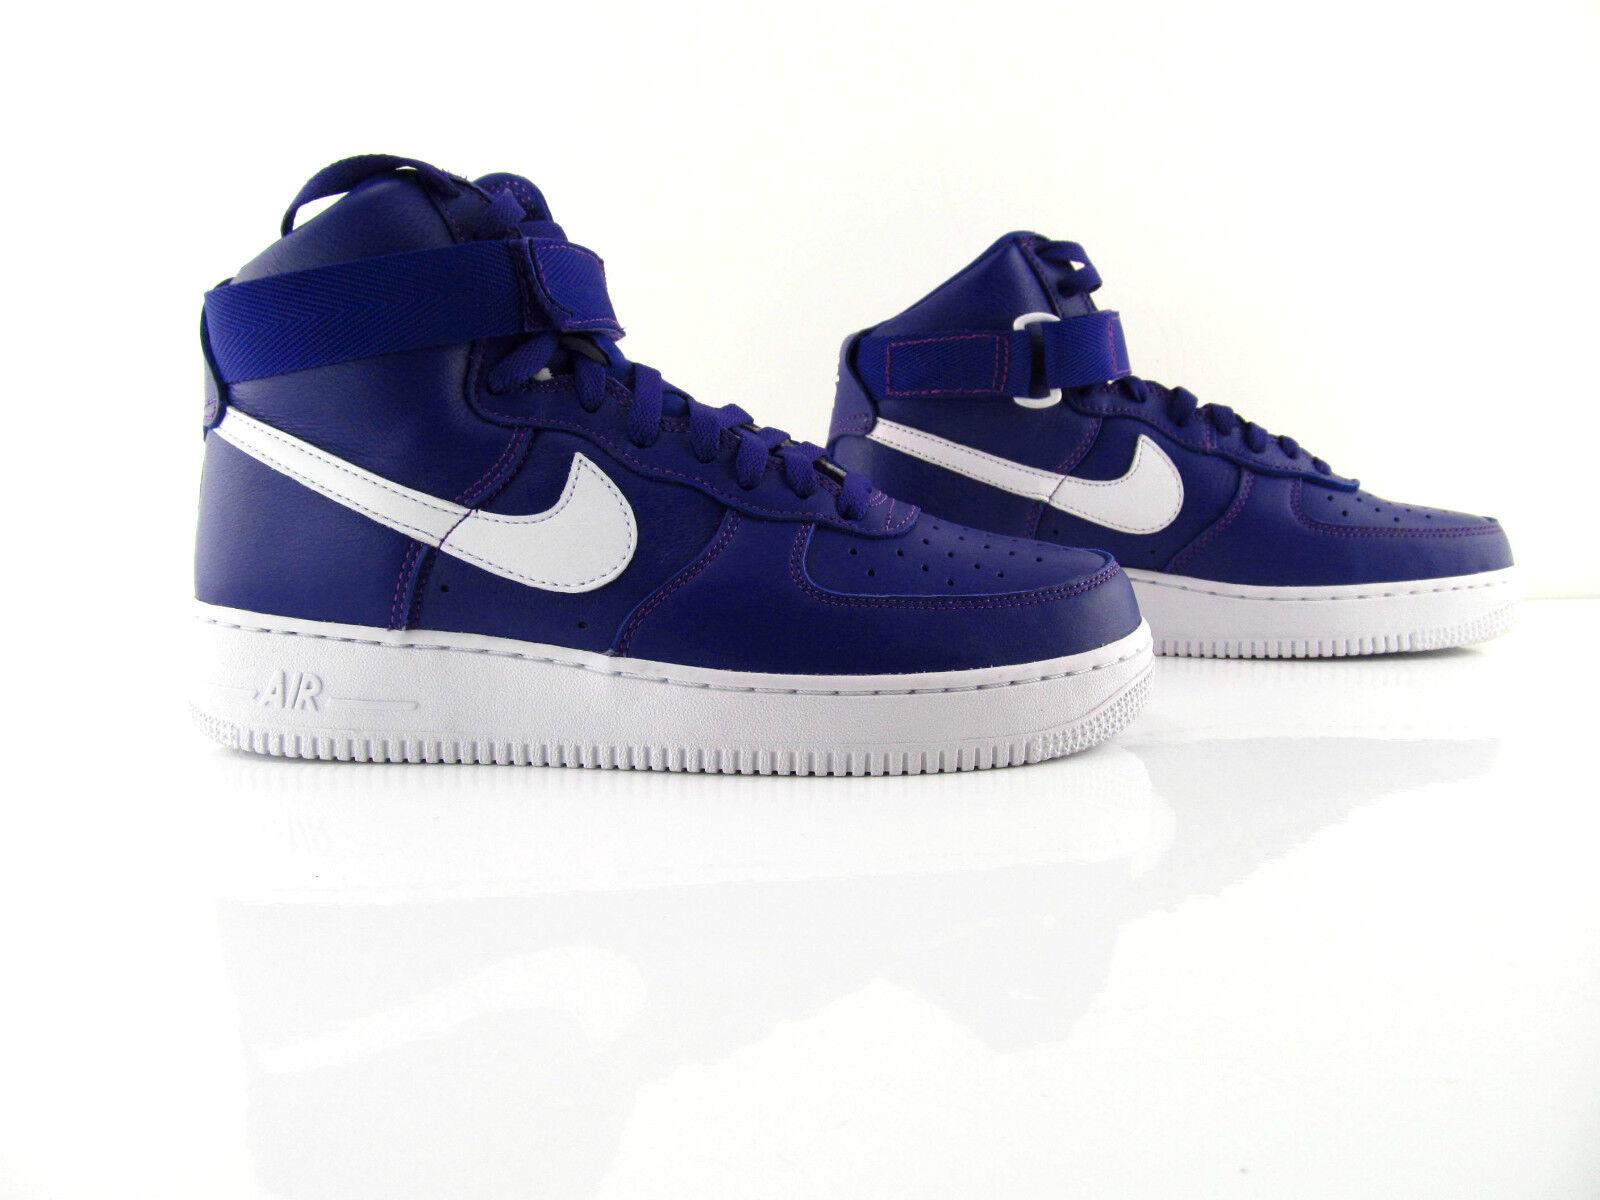 Nike Air Forde Forde Forde 1 Nikelab lila Weiß UK_7 US_8  Eur 41  f2482a